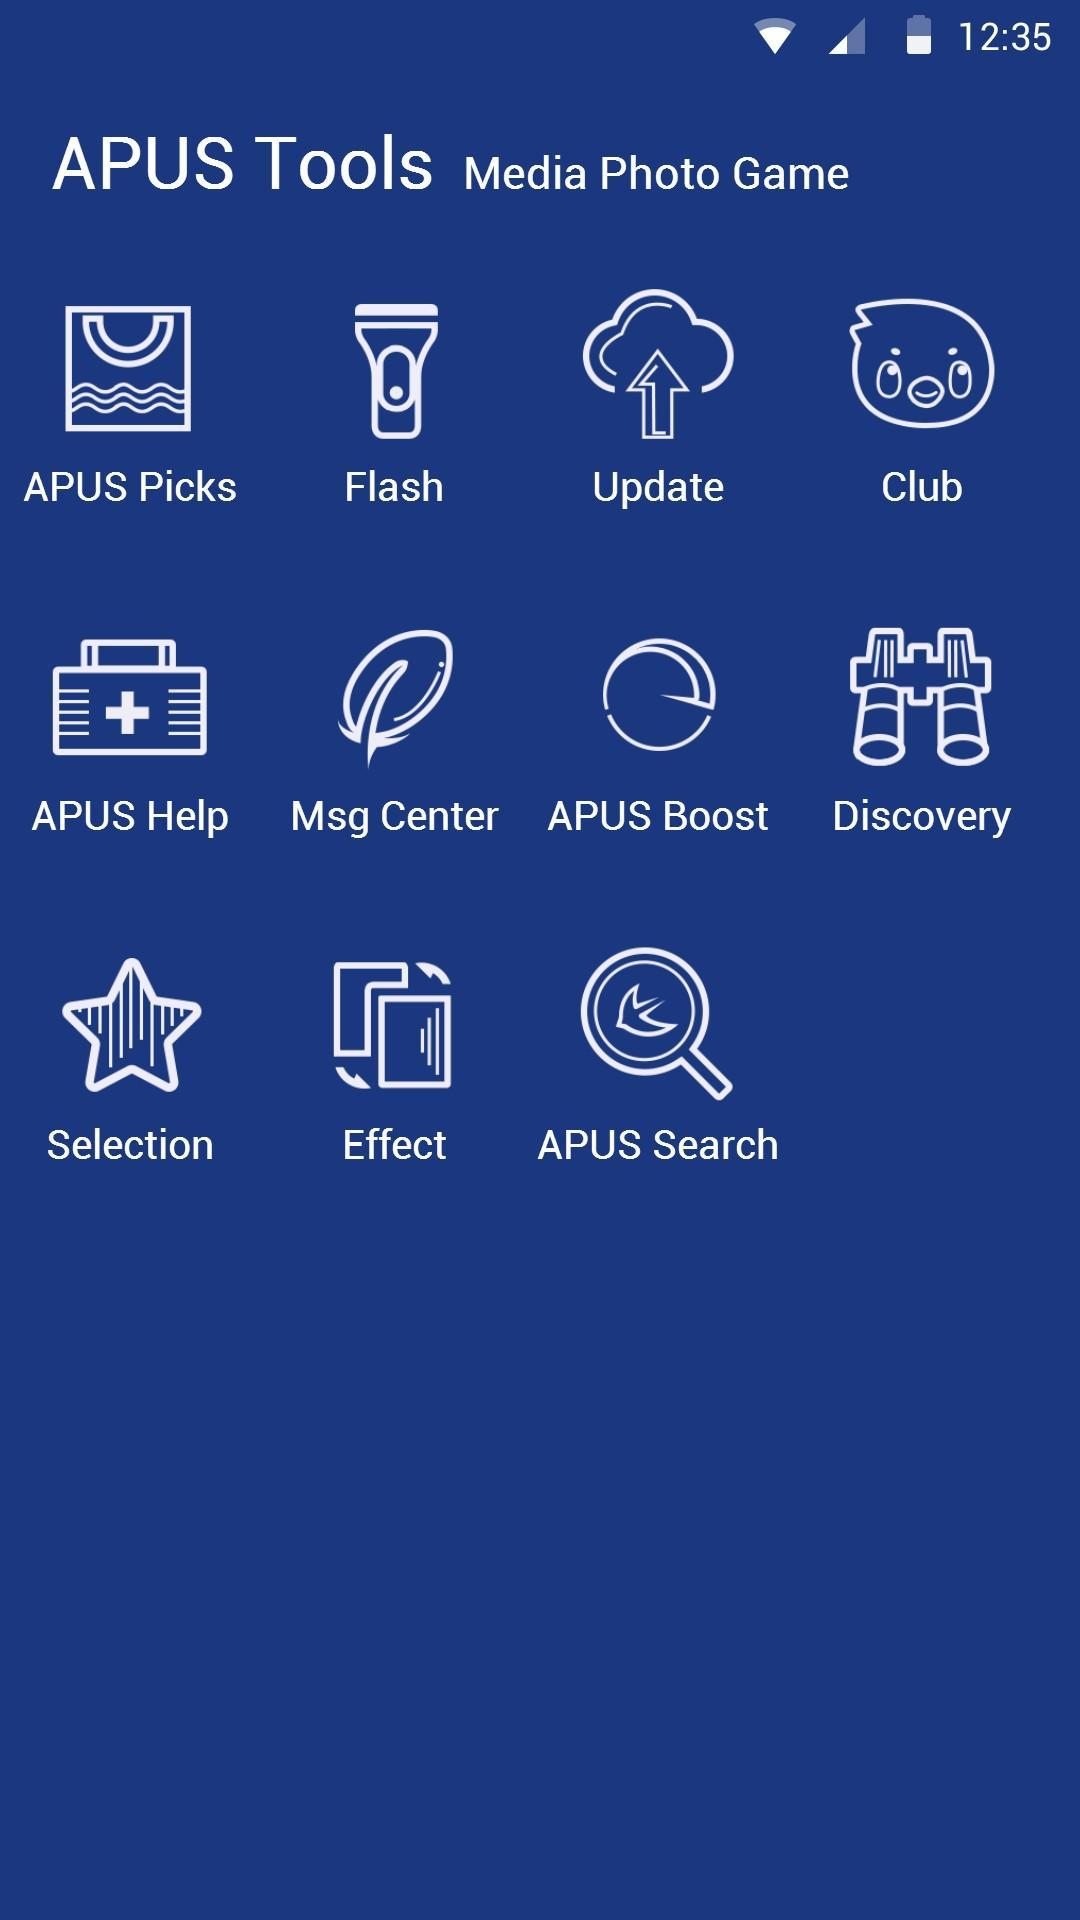 Unduh 9000+ Wallpaper Biru Android Hd  Gratis